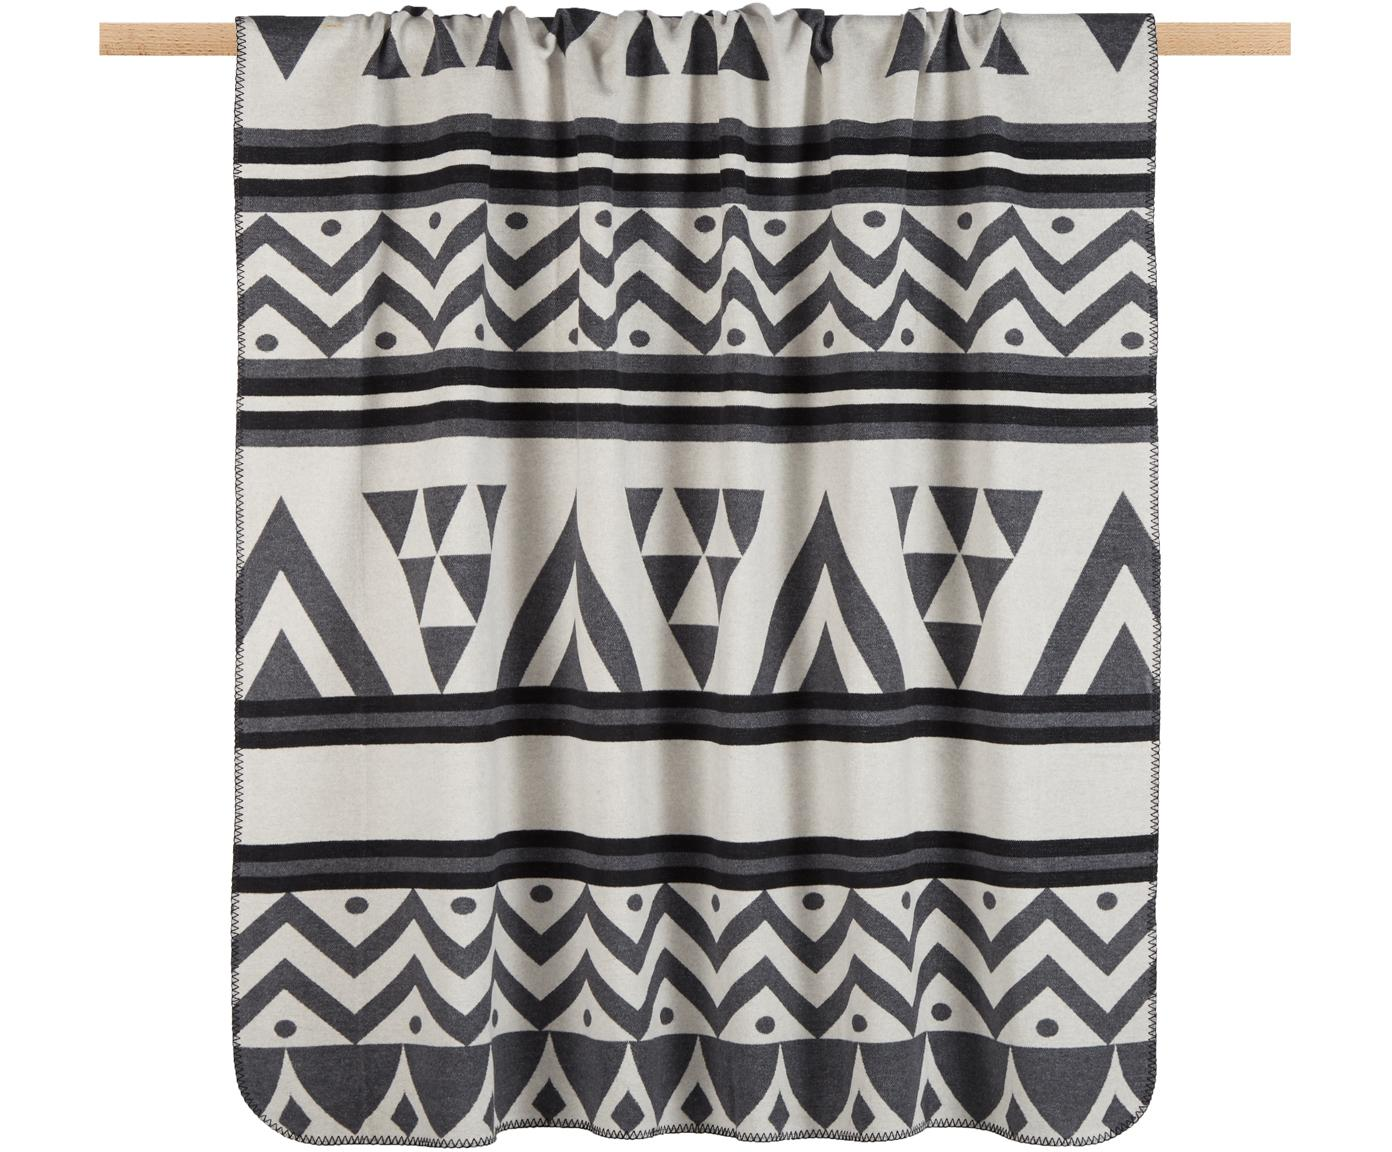 Manta Cape, 65%algodón, 35%poliacrílico, Negro, gris, beige, An 150 x L 200 cm